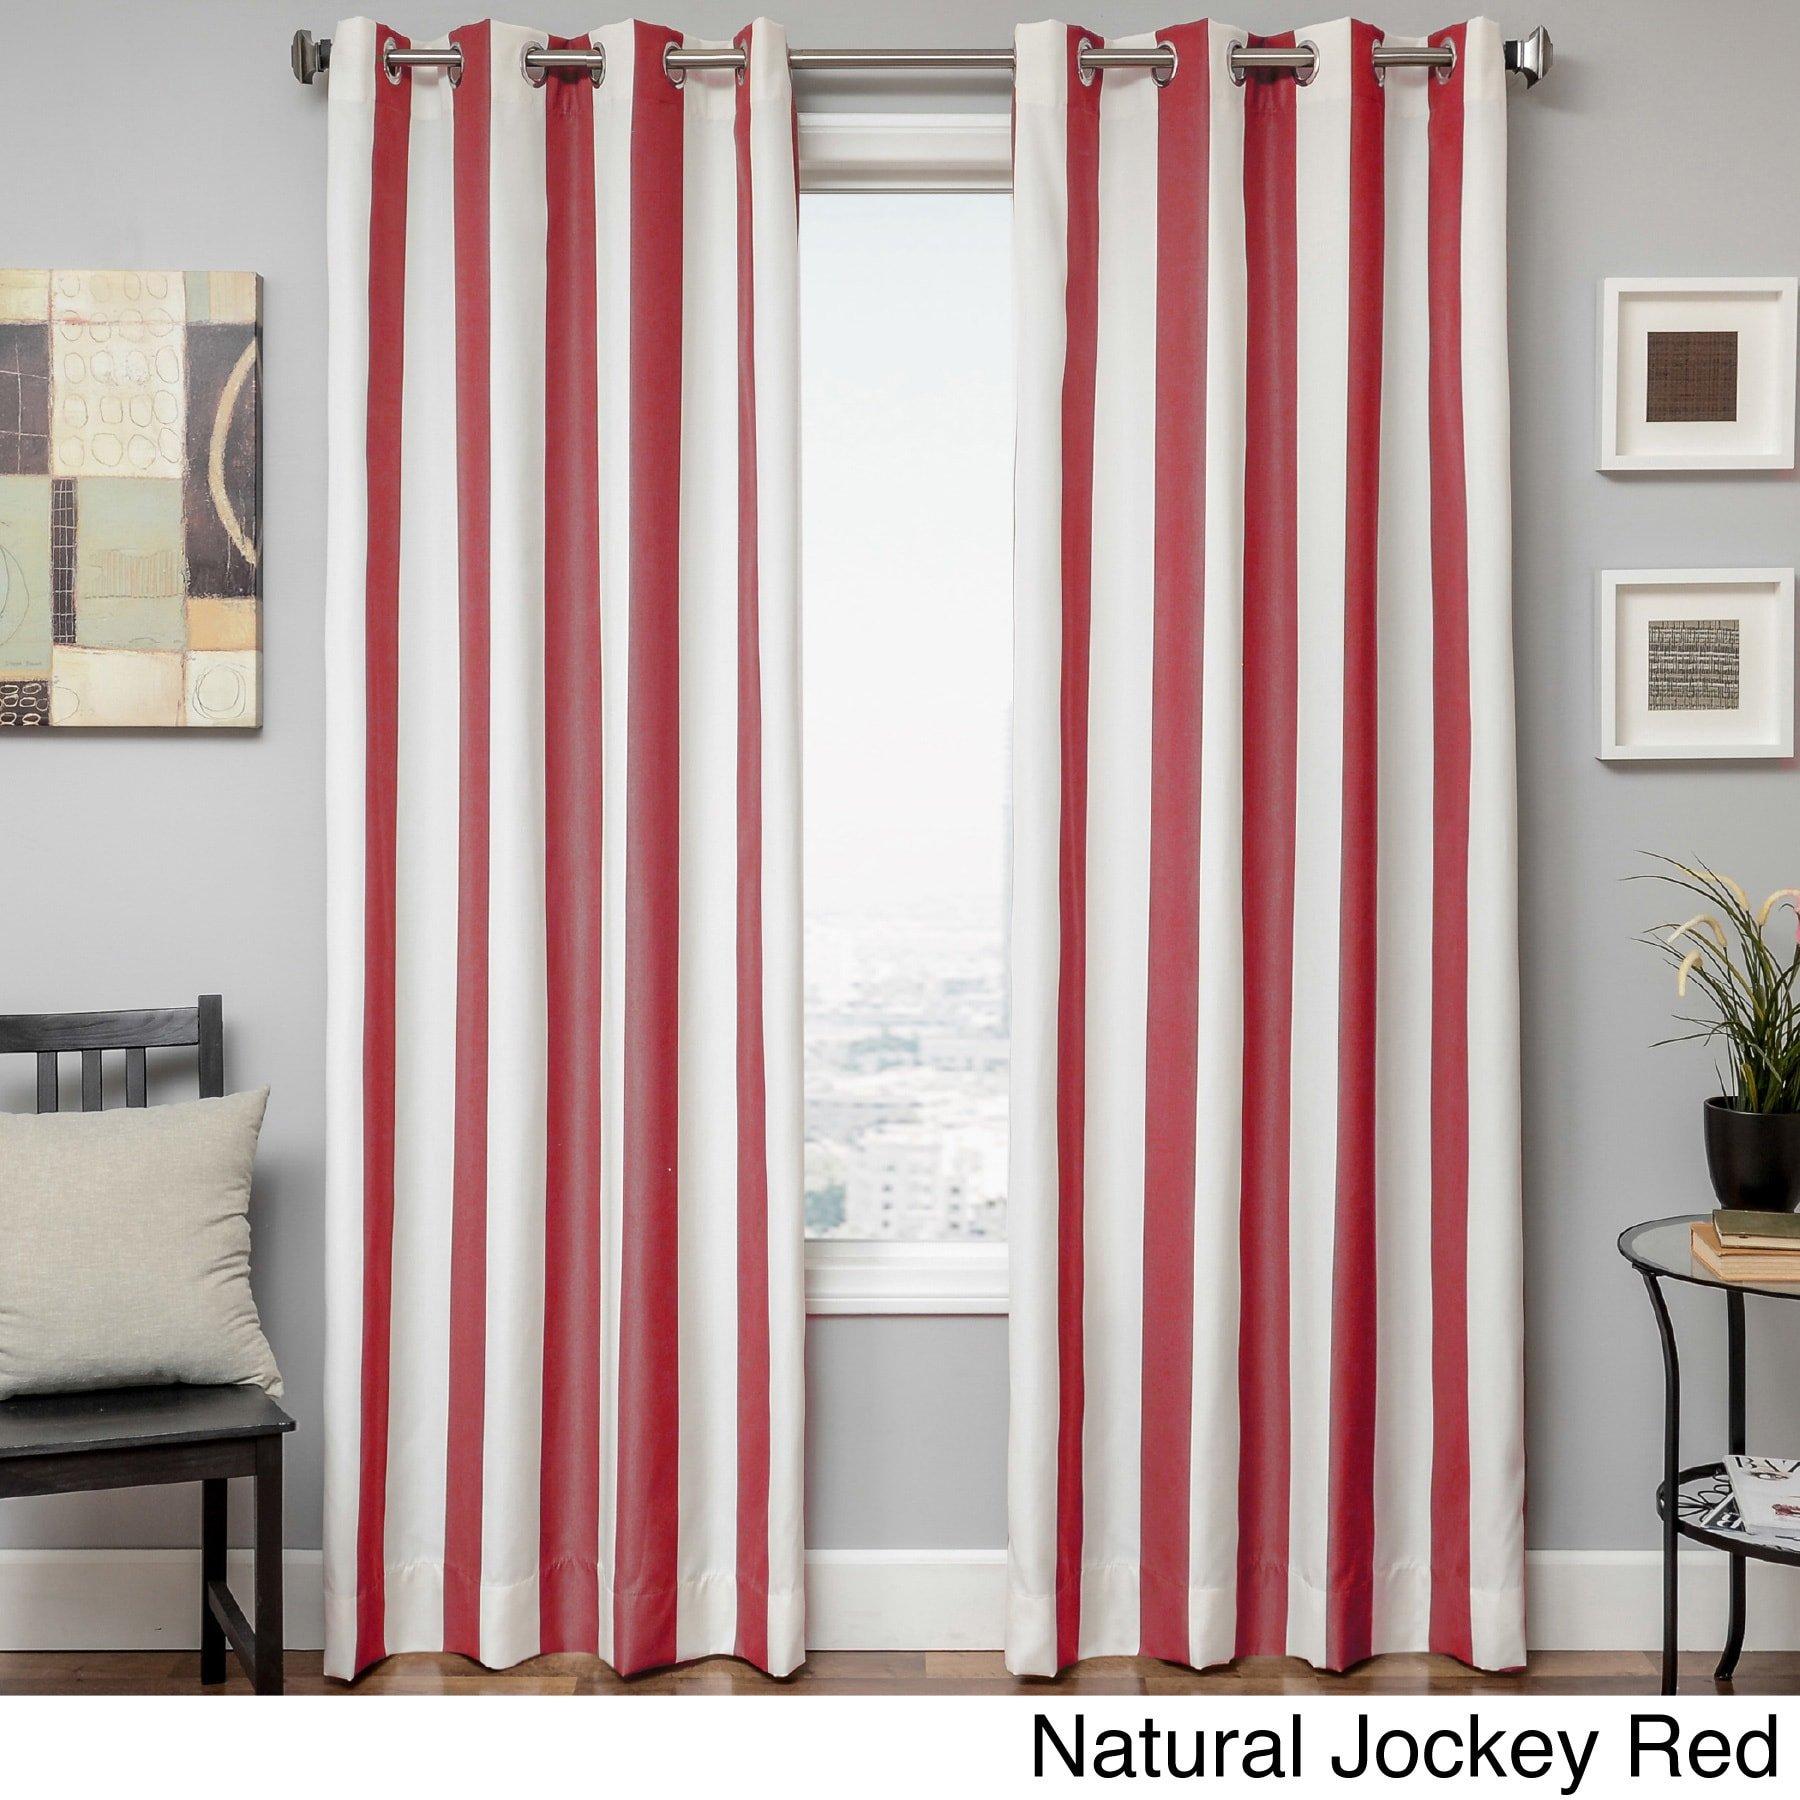 Softline Sunbrella Cabana Stripe Indoor/Outdoor Curtain Panel Red 52 x 96 96 Inches